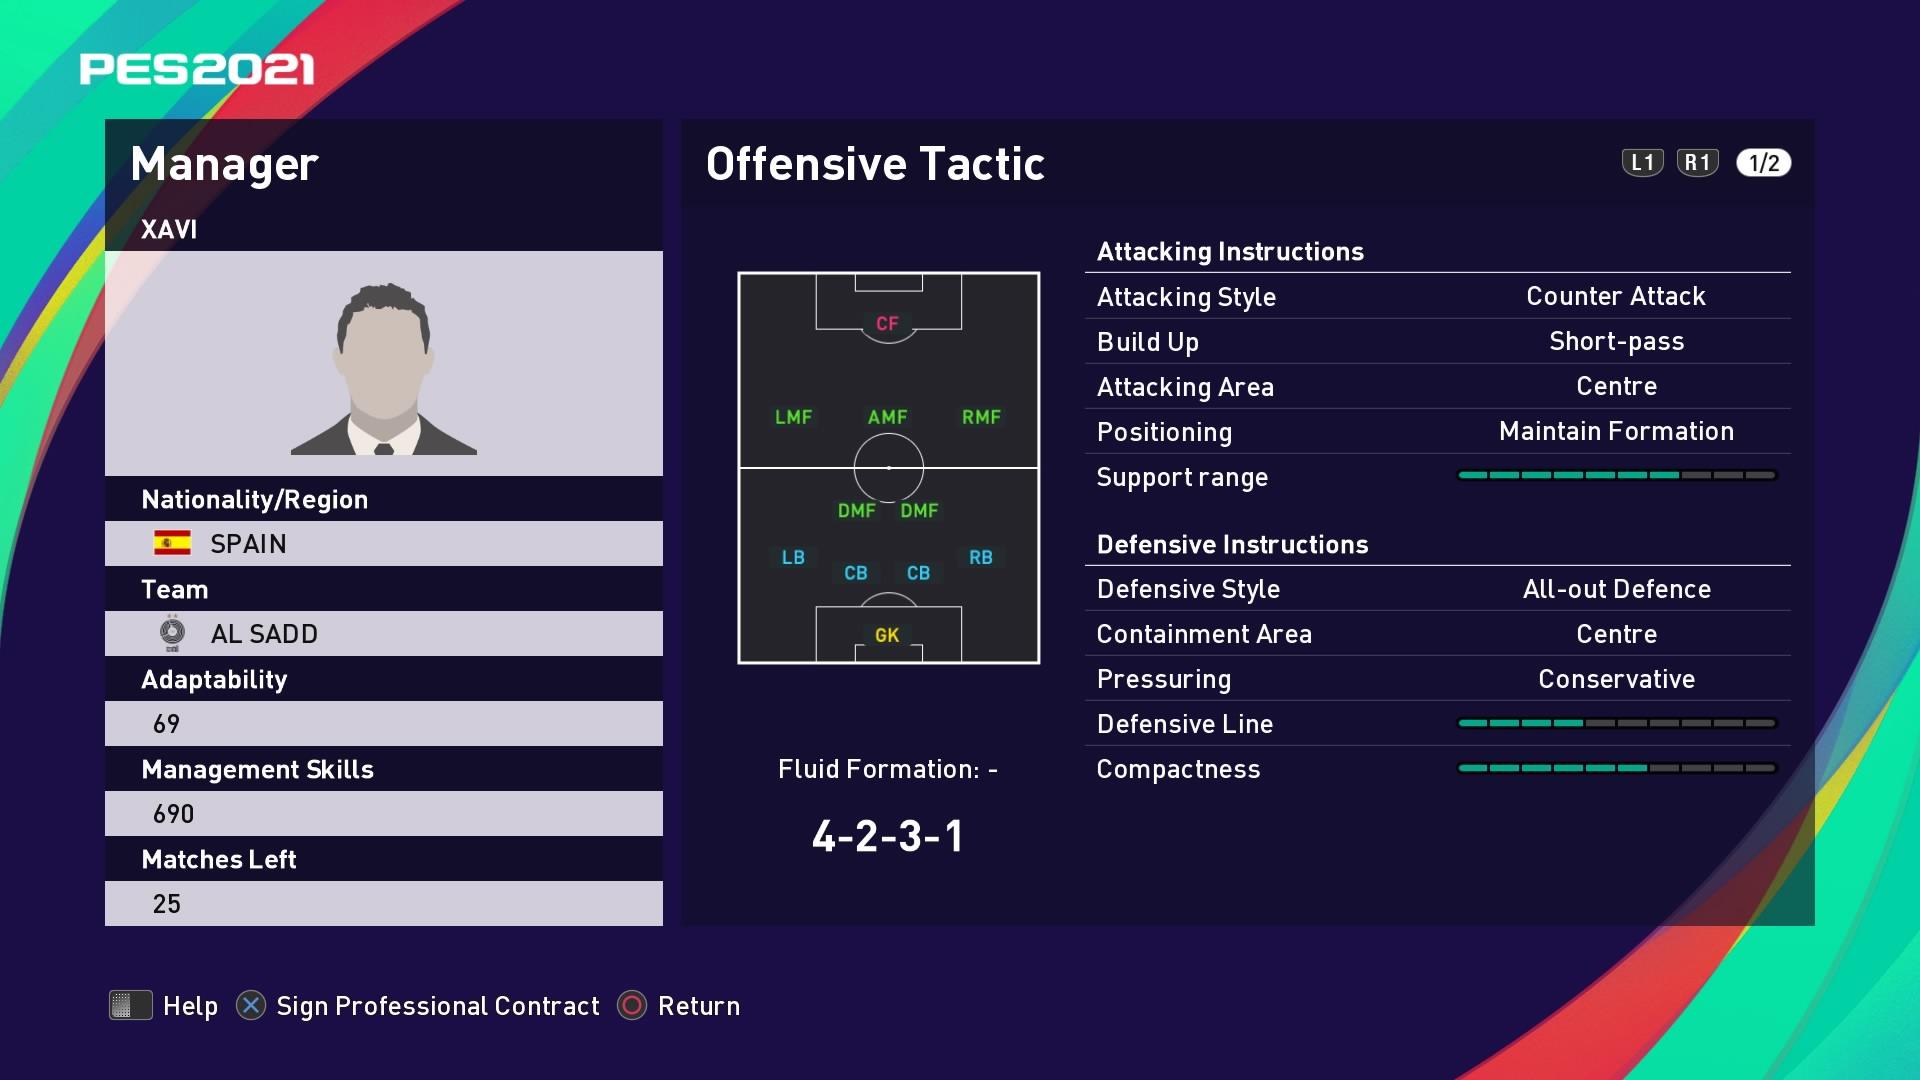 Xavi Offensive Tactic in PES 2021 myClub